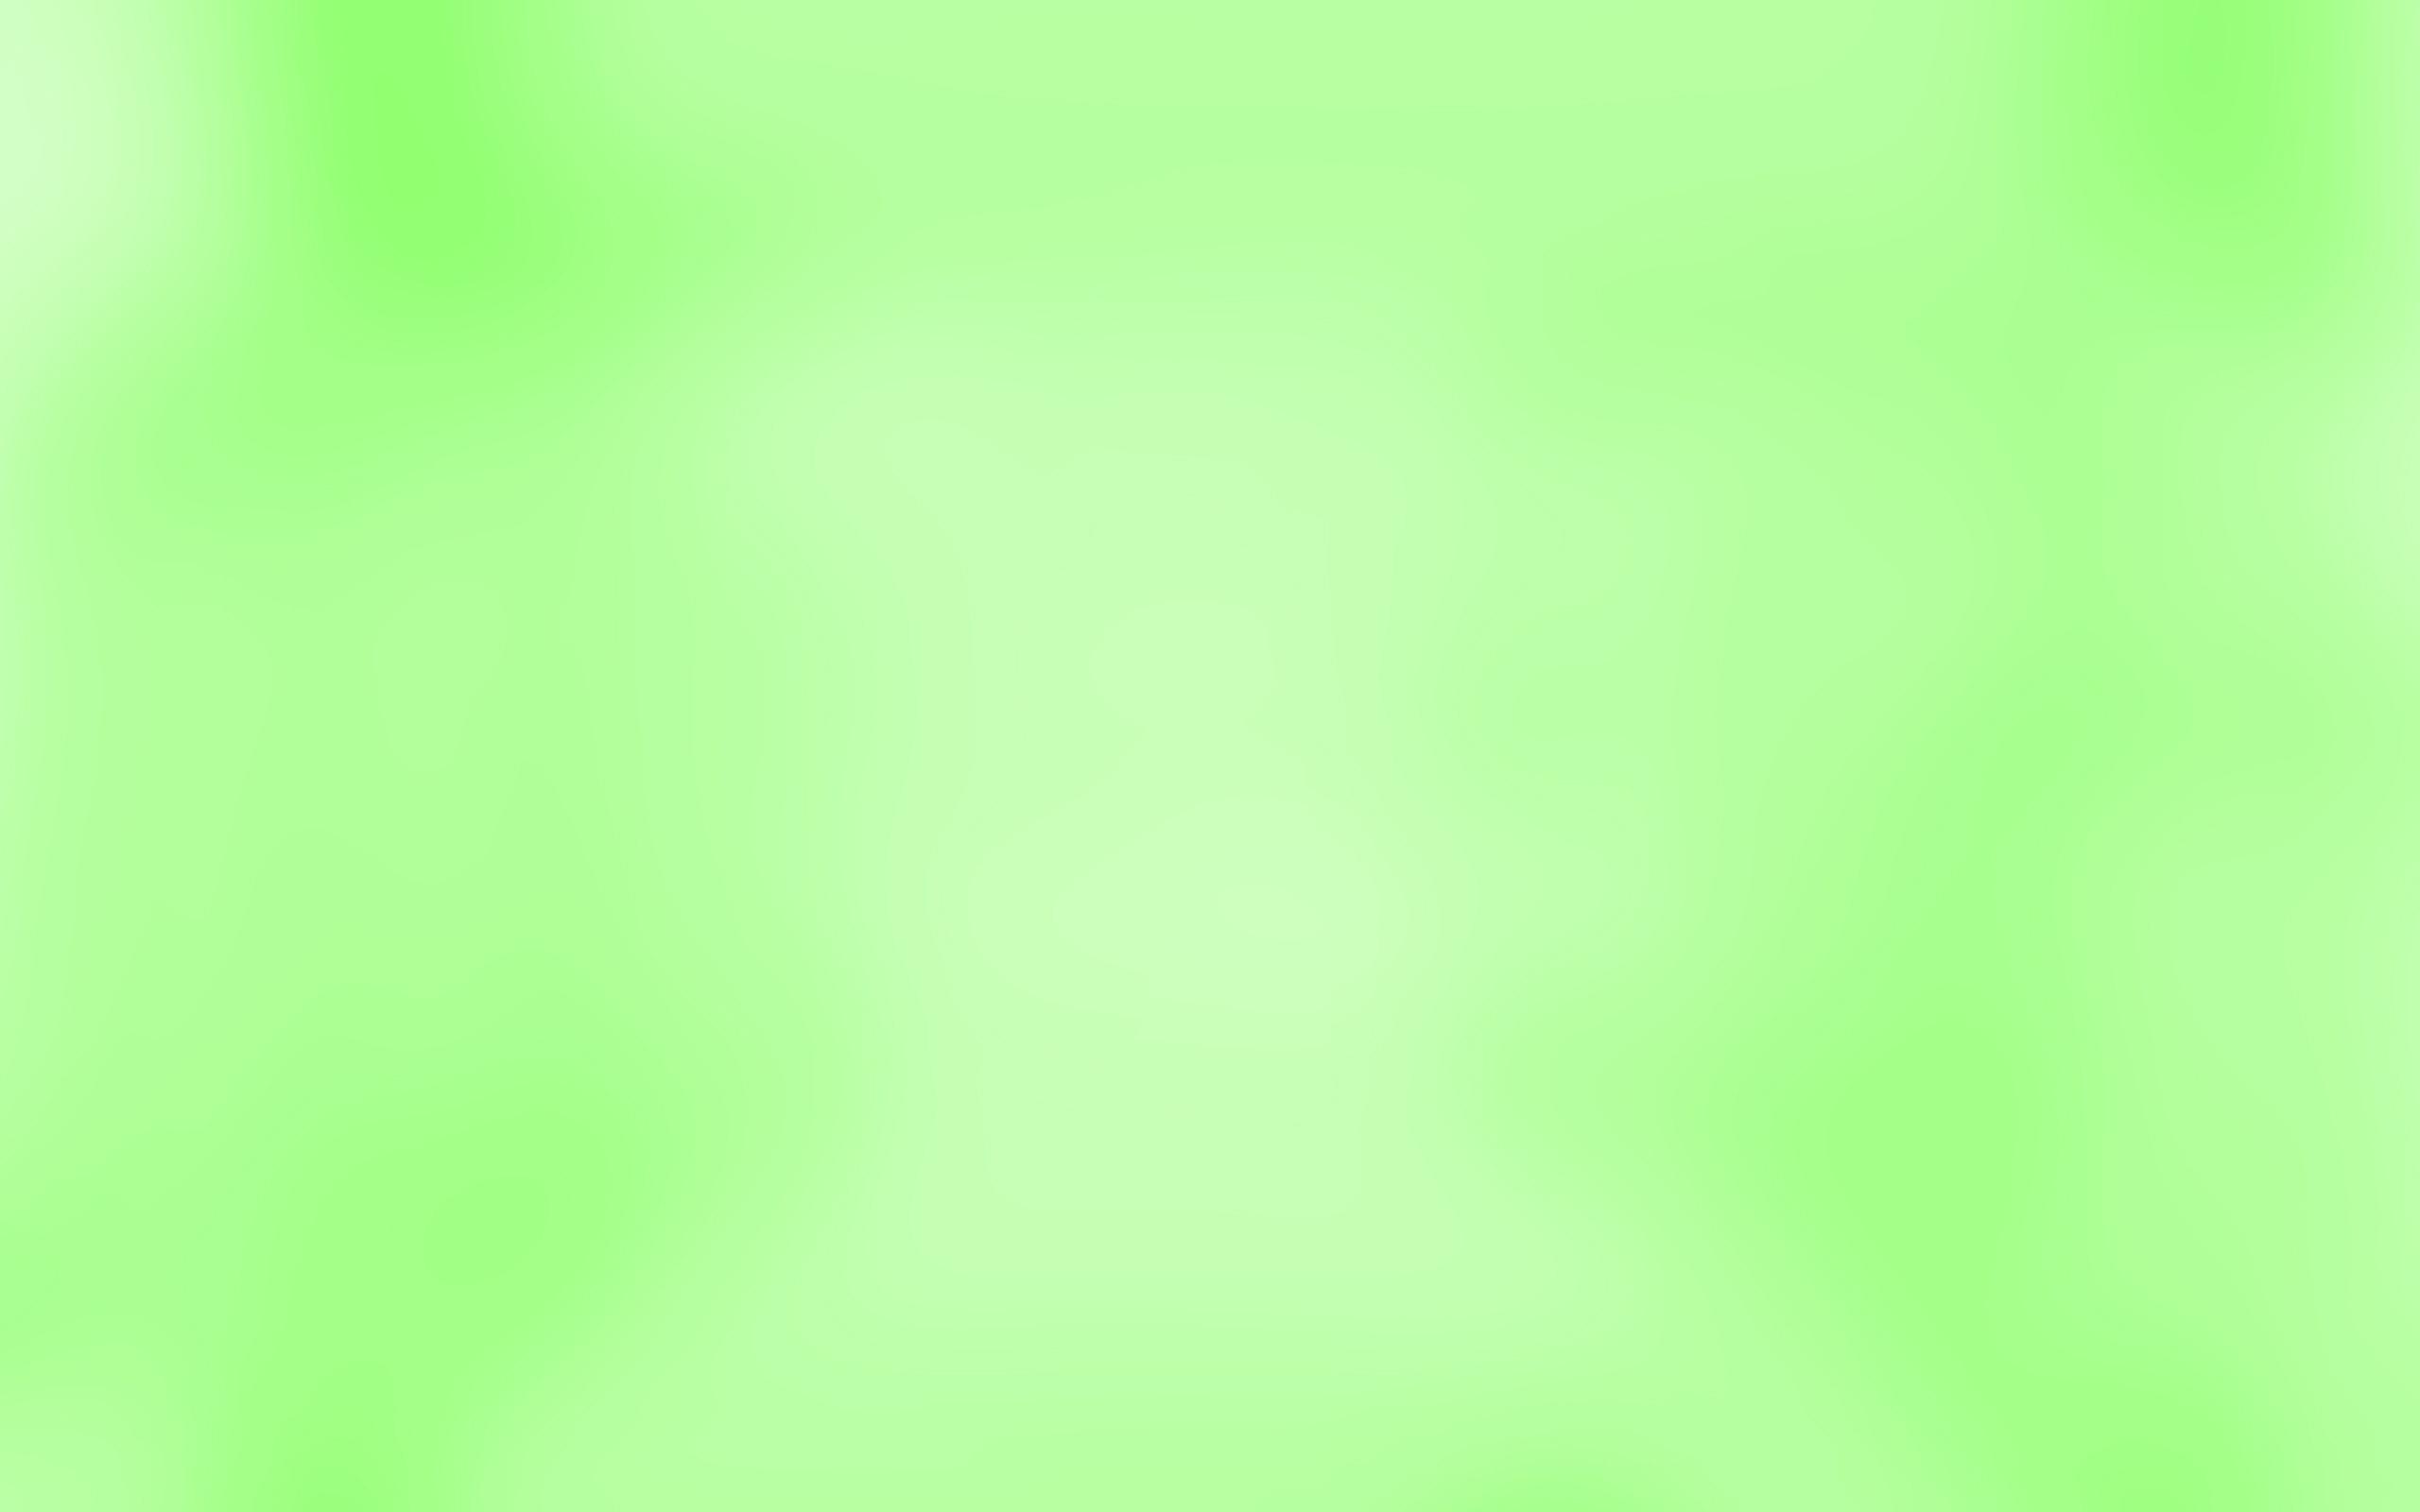 Light Green Hd Background   Wallpaper   Basic Background